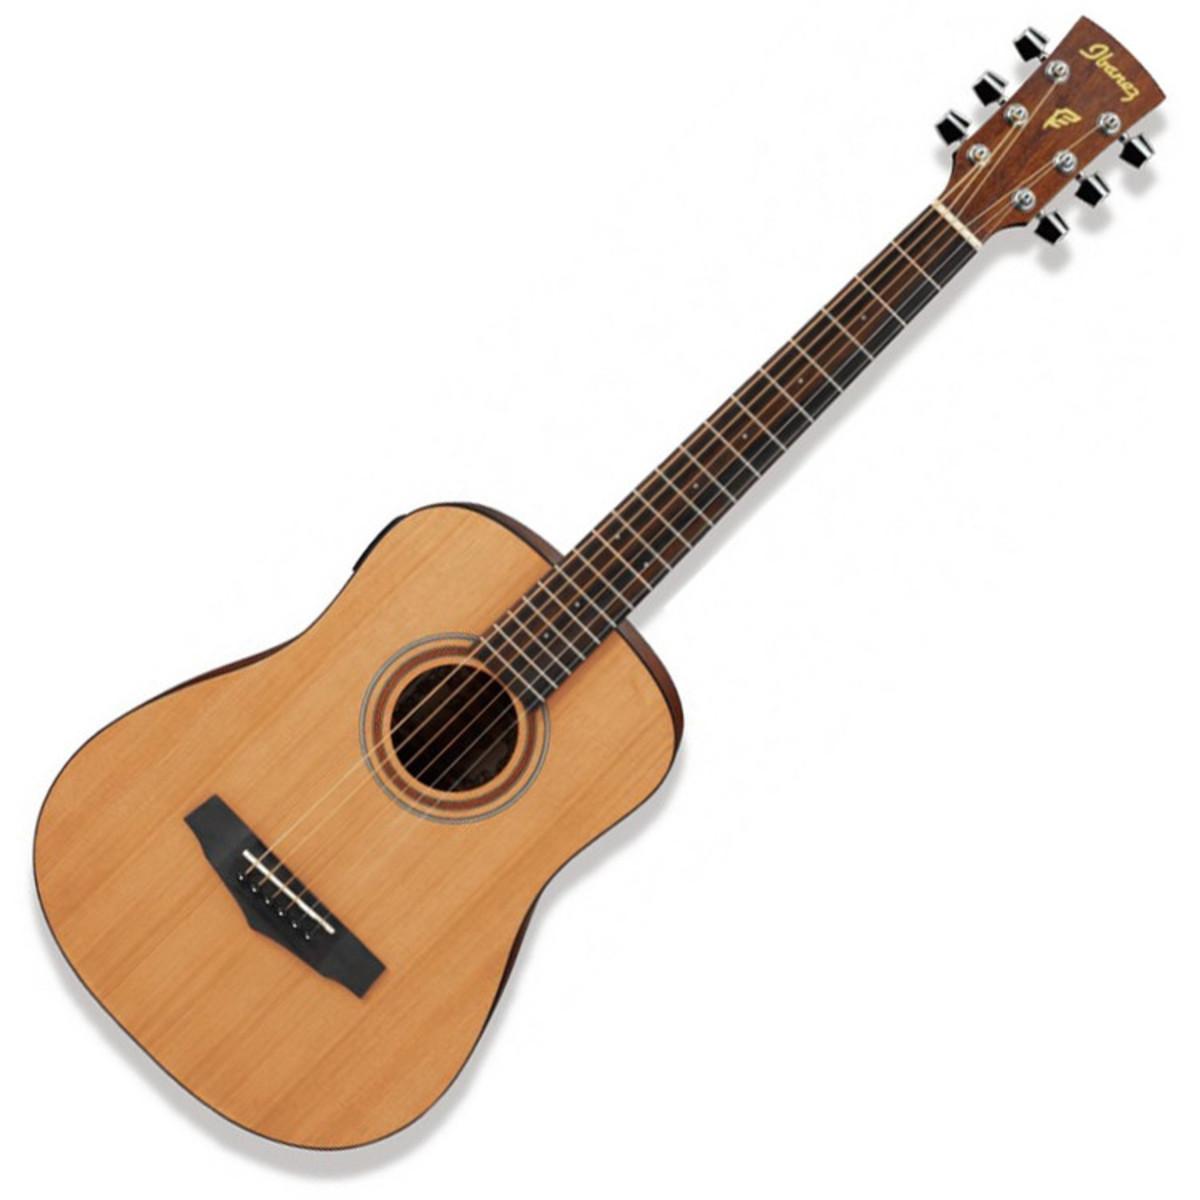 ibanez mini pf58 guitare acoustique de voyage naturel. Black Bedroom Furniture Sets. Home Design Ideas